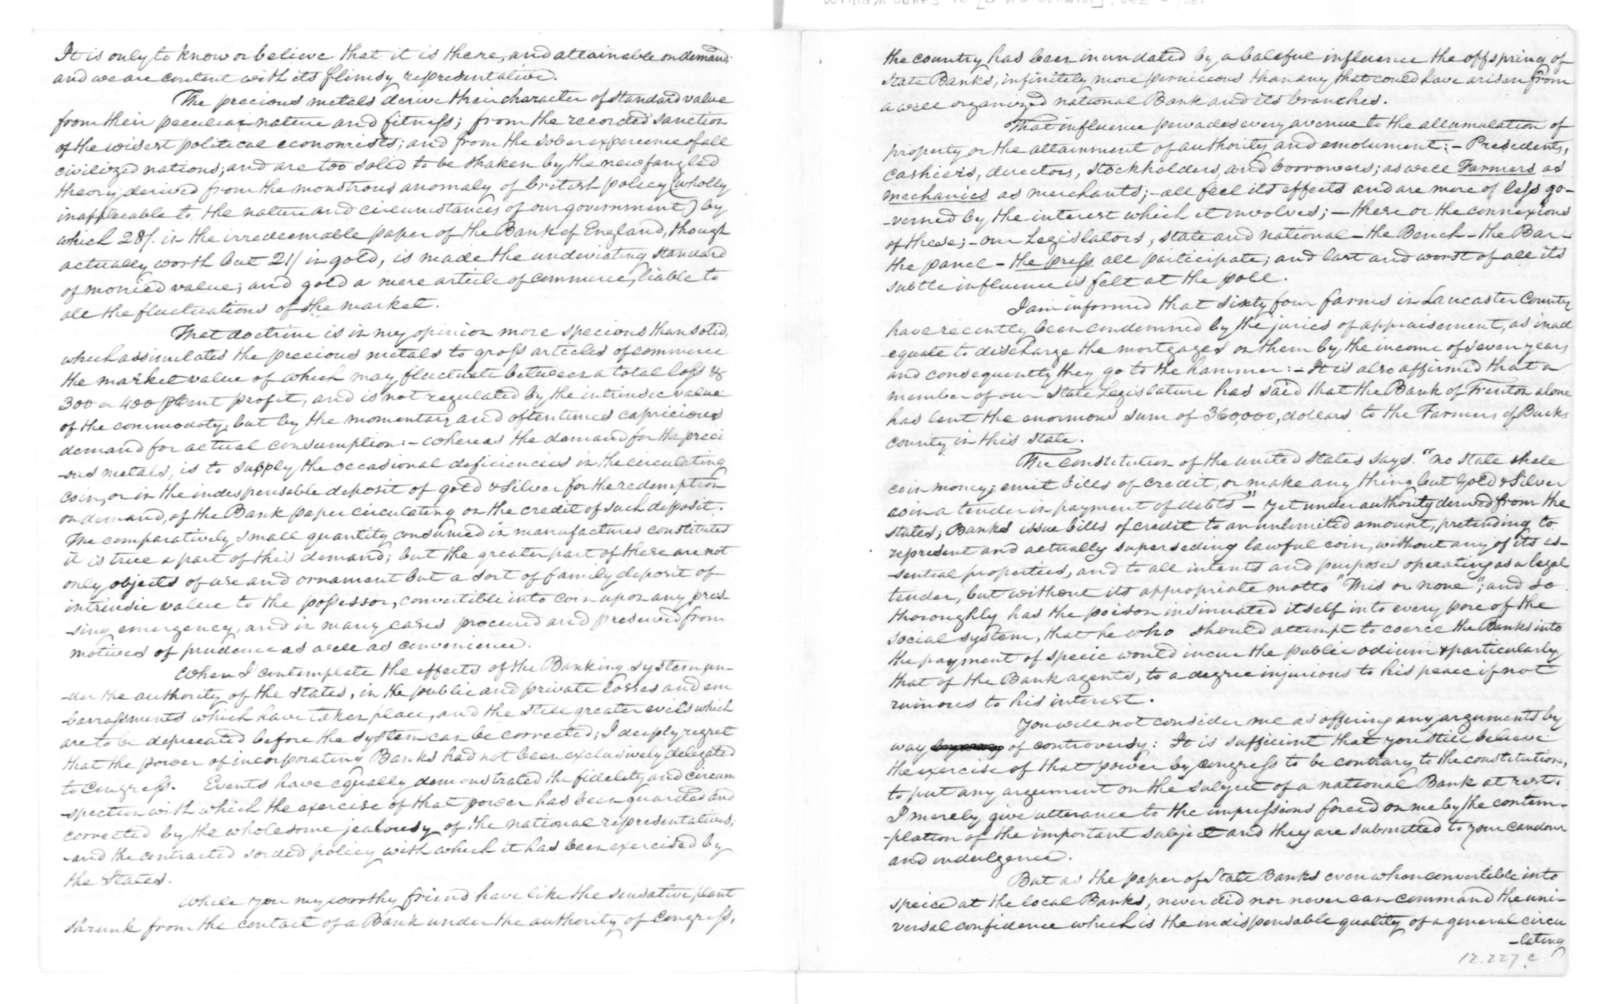 William Jones to James Madison, January 1, 1816.